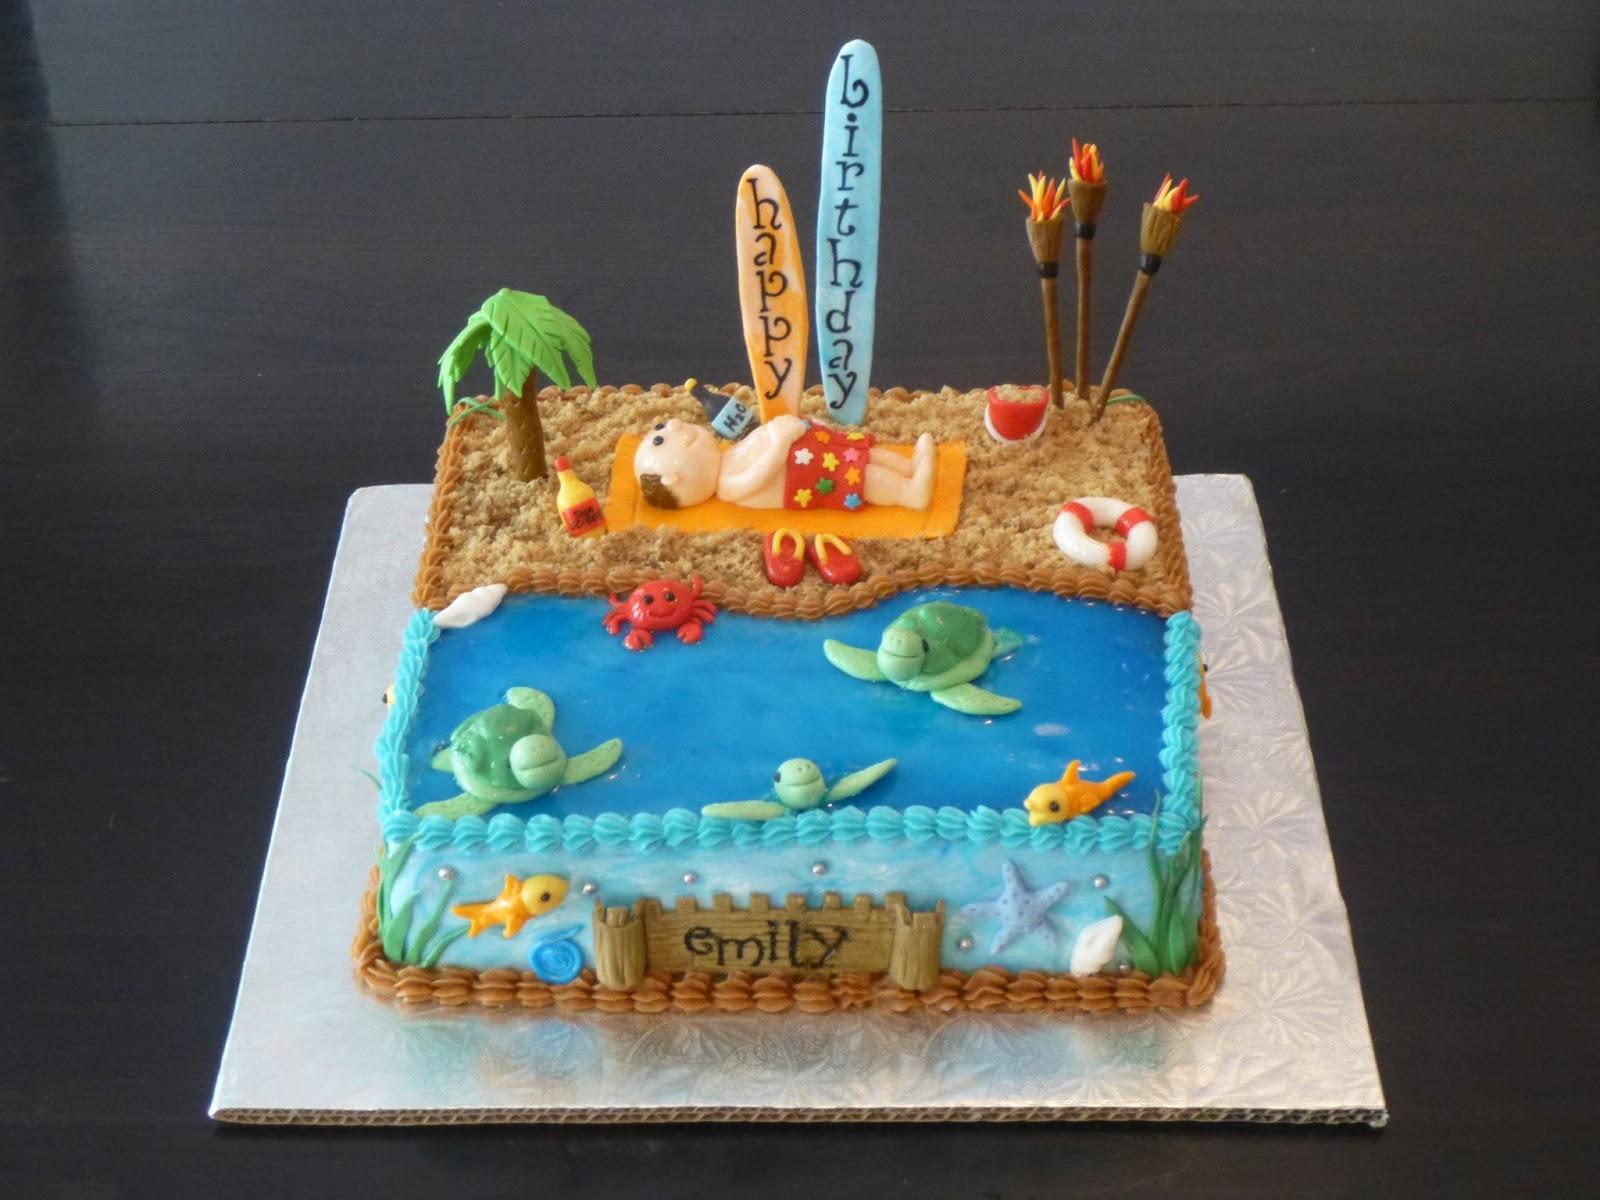 CLASSIC CAKES Emilys Memories Of Maui Birthday Cake - Maui birthday cakes